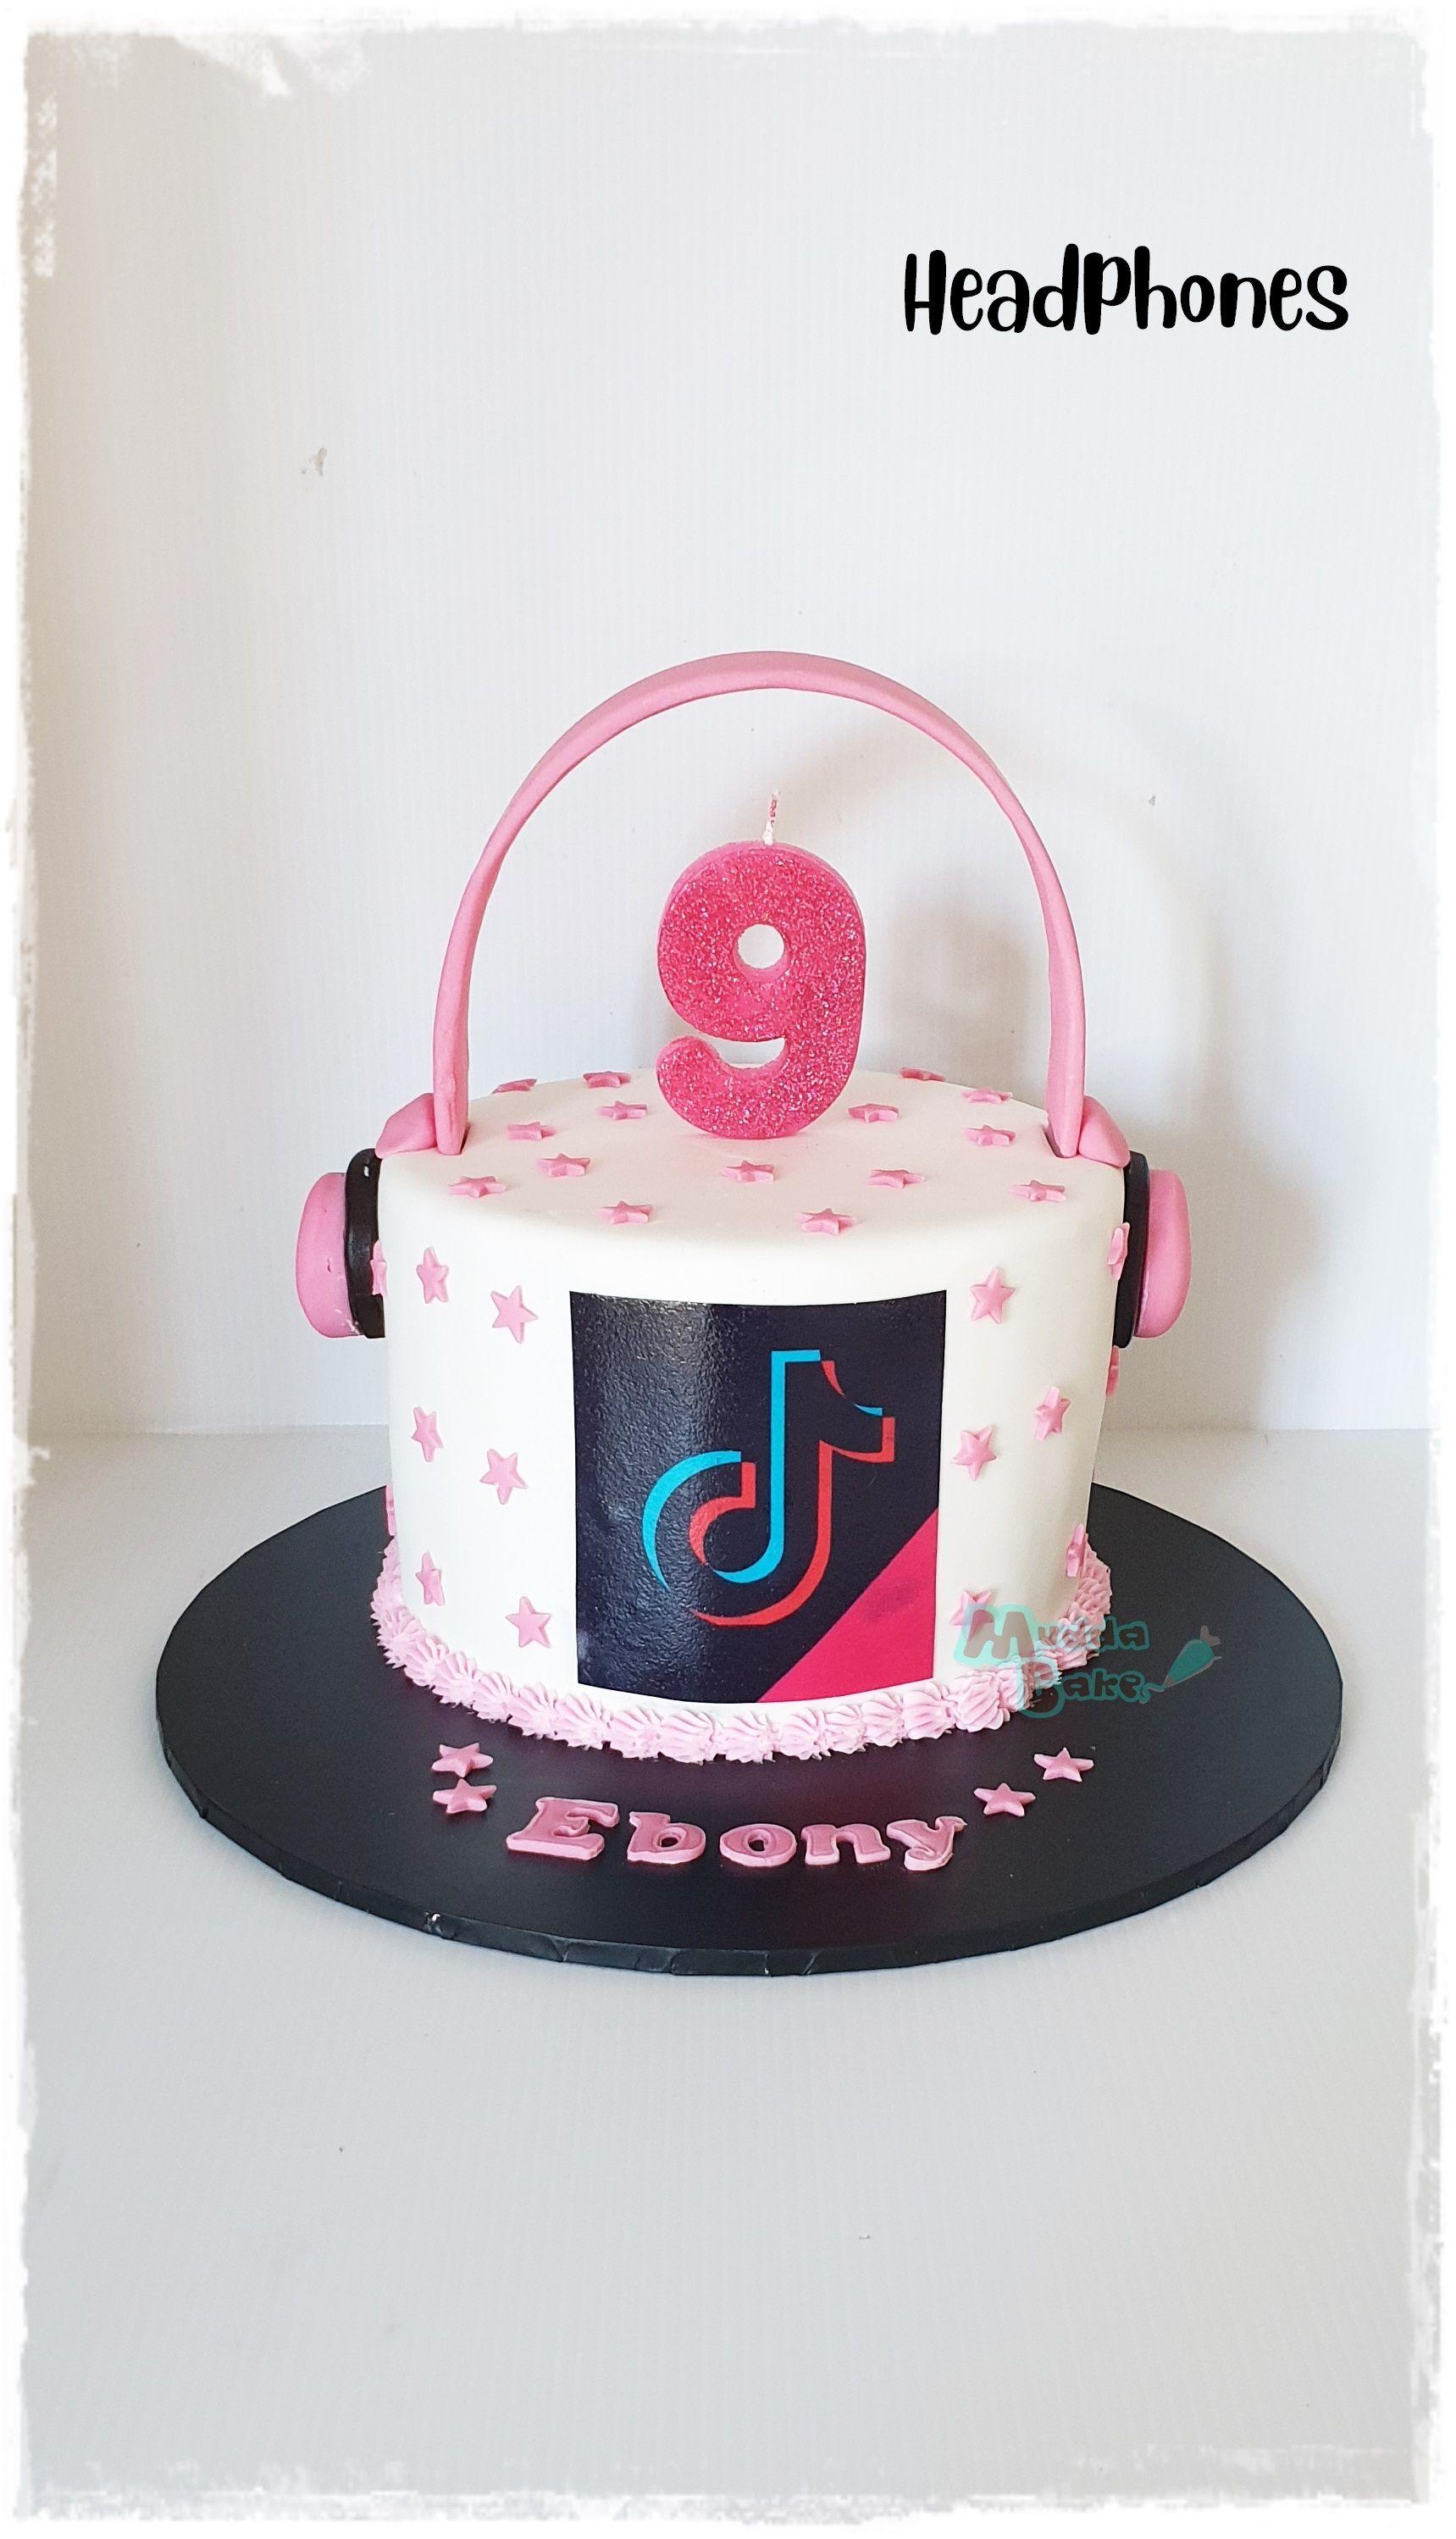 Headphones & Tik Tok Cake in 2020 Unique birthday cakes